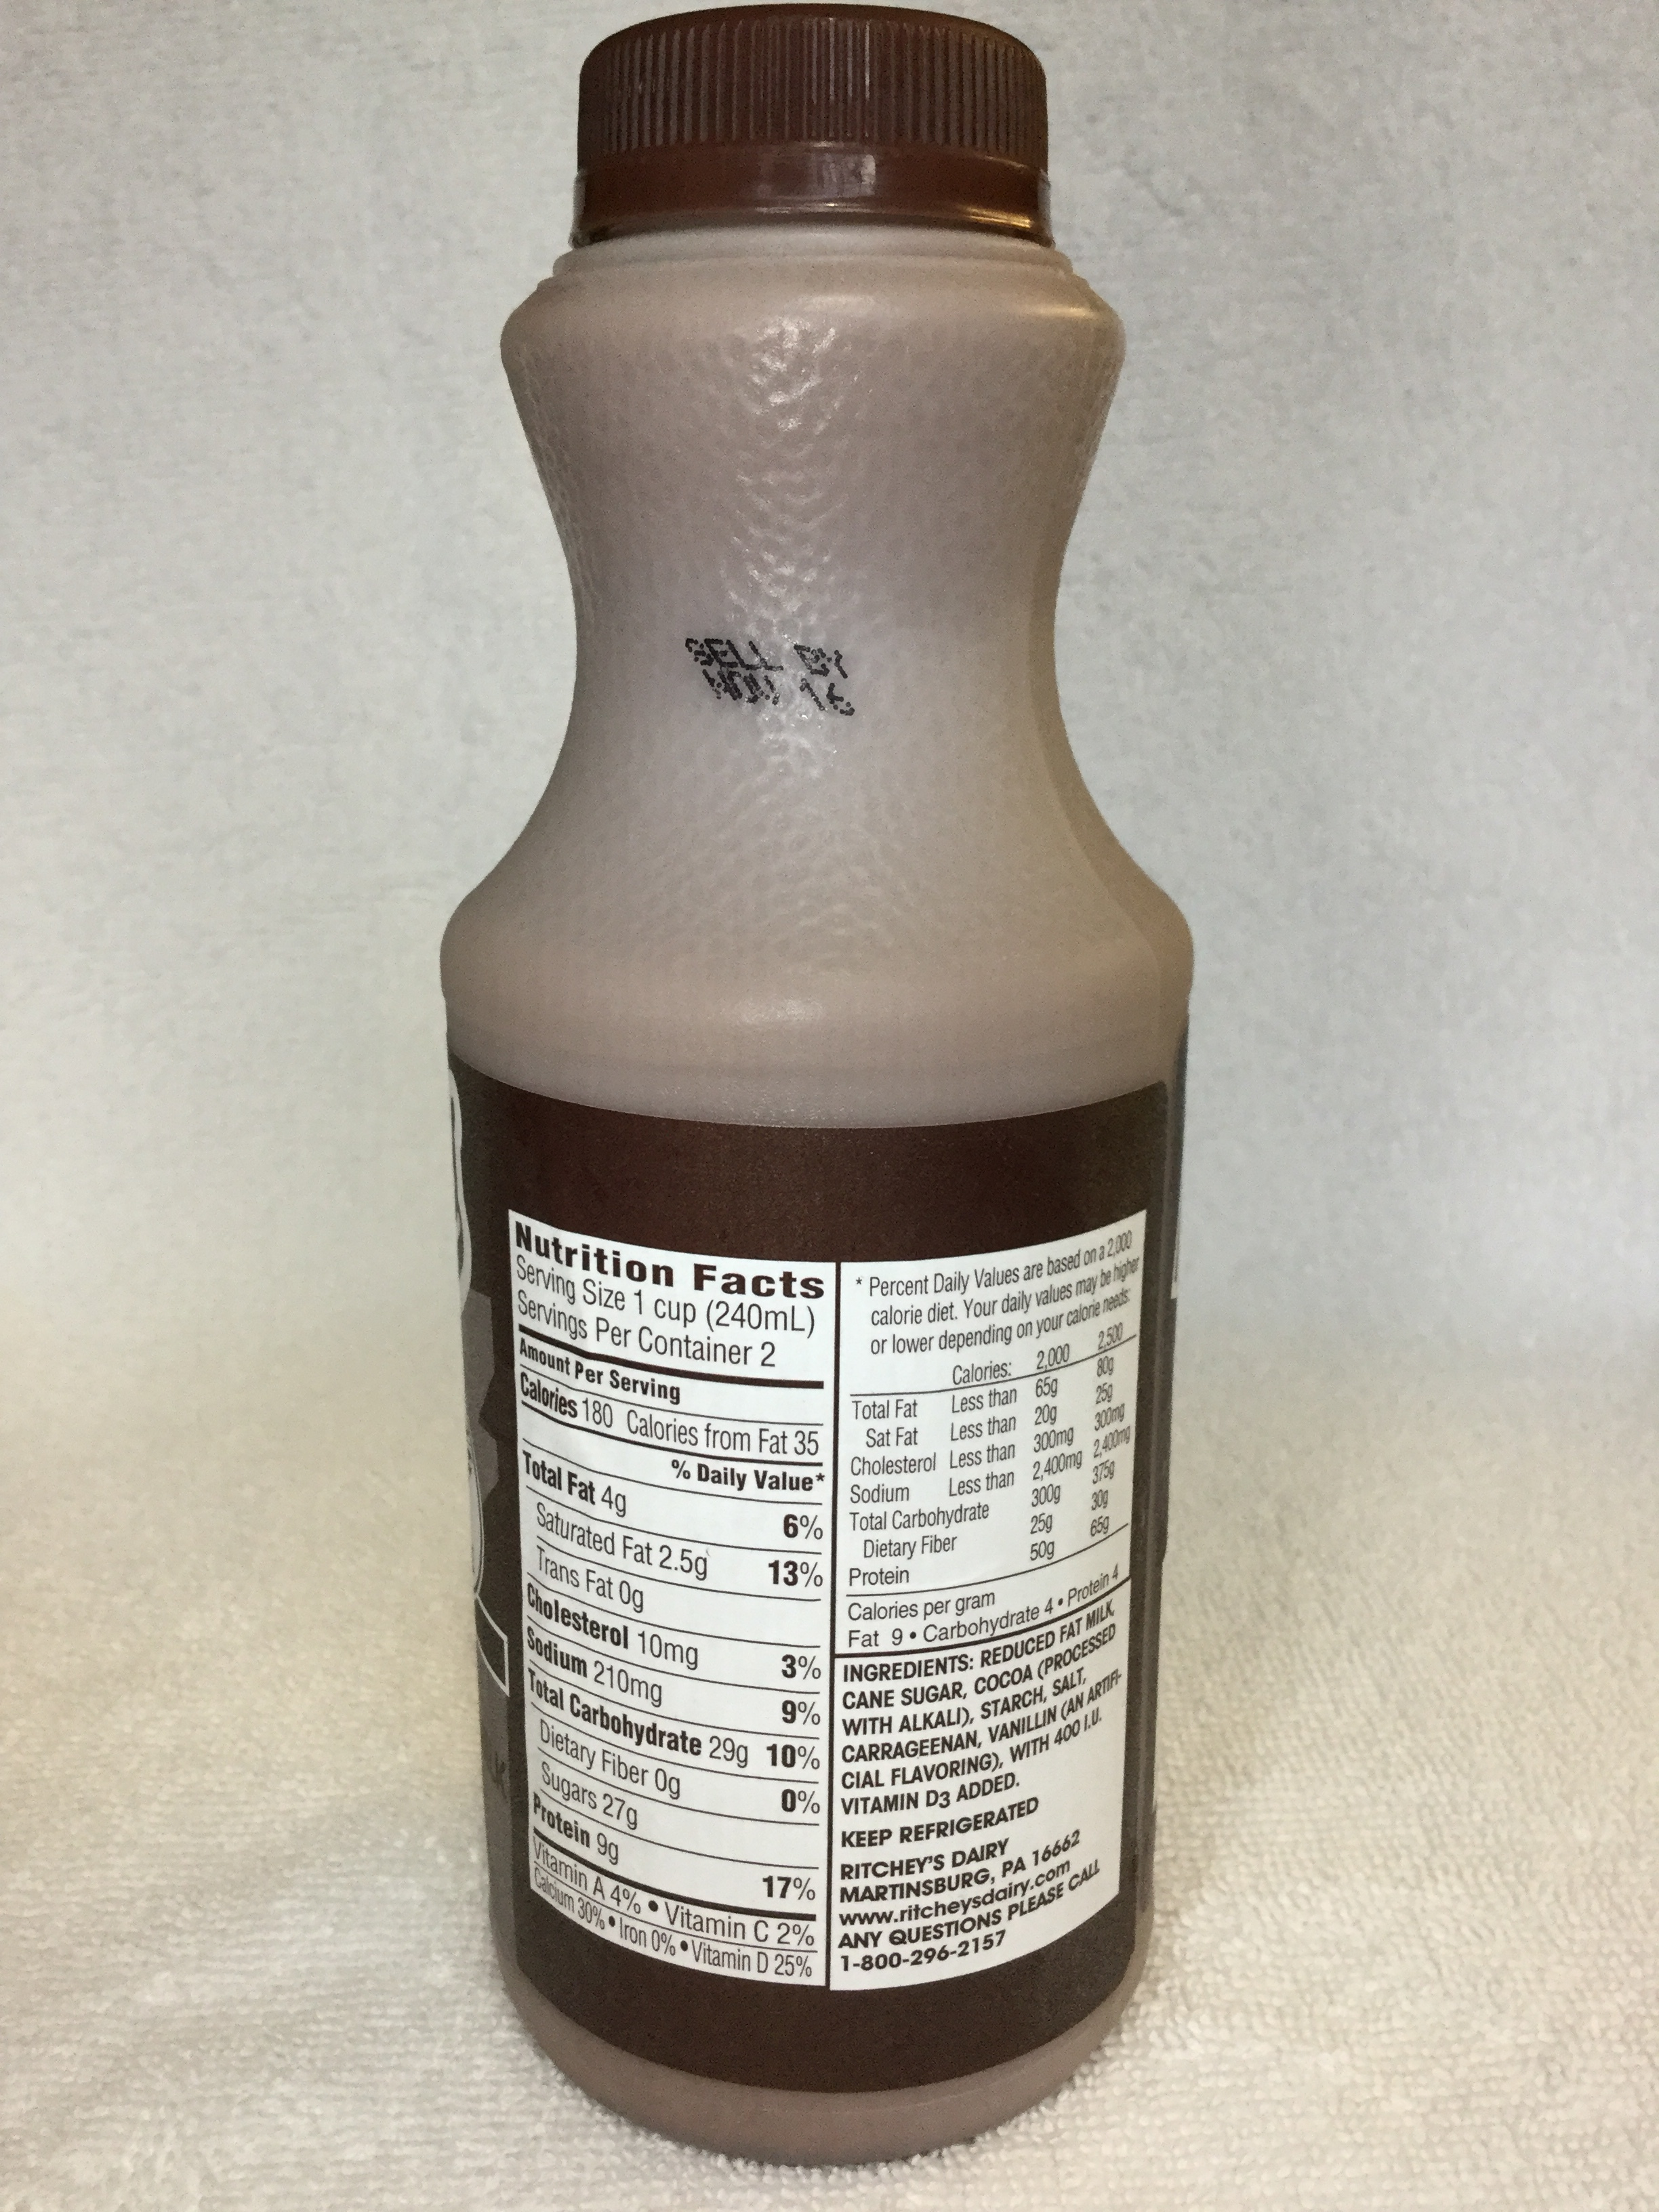 Ritchey's Chocolate Milk Side 1